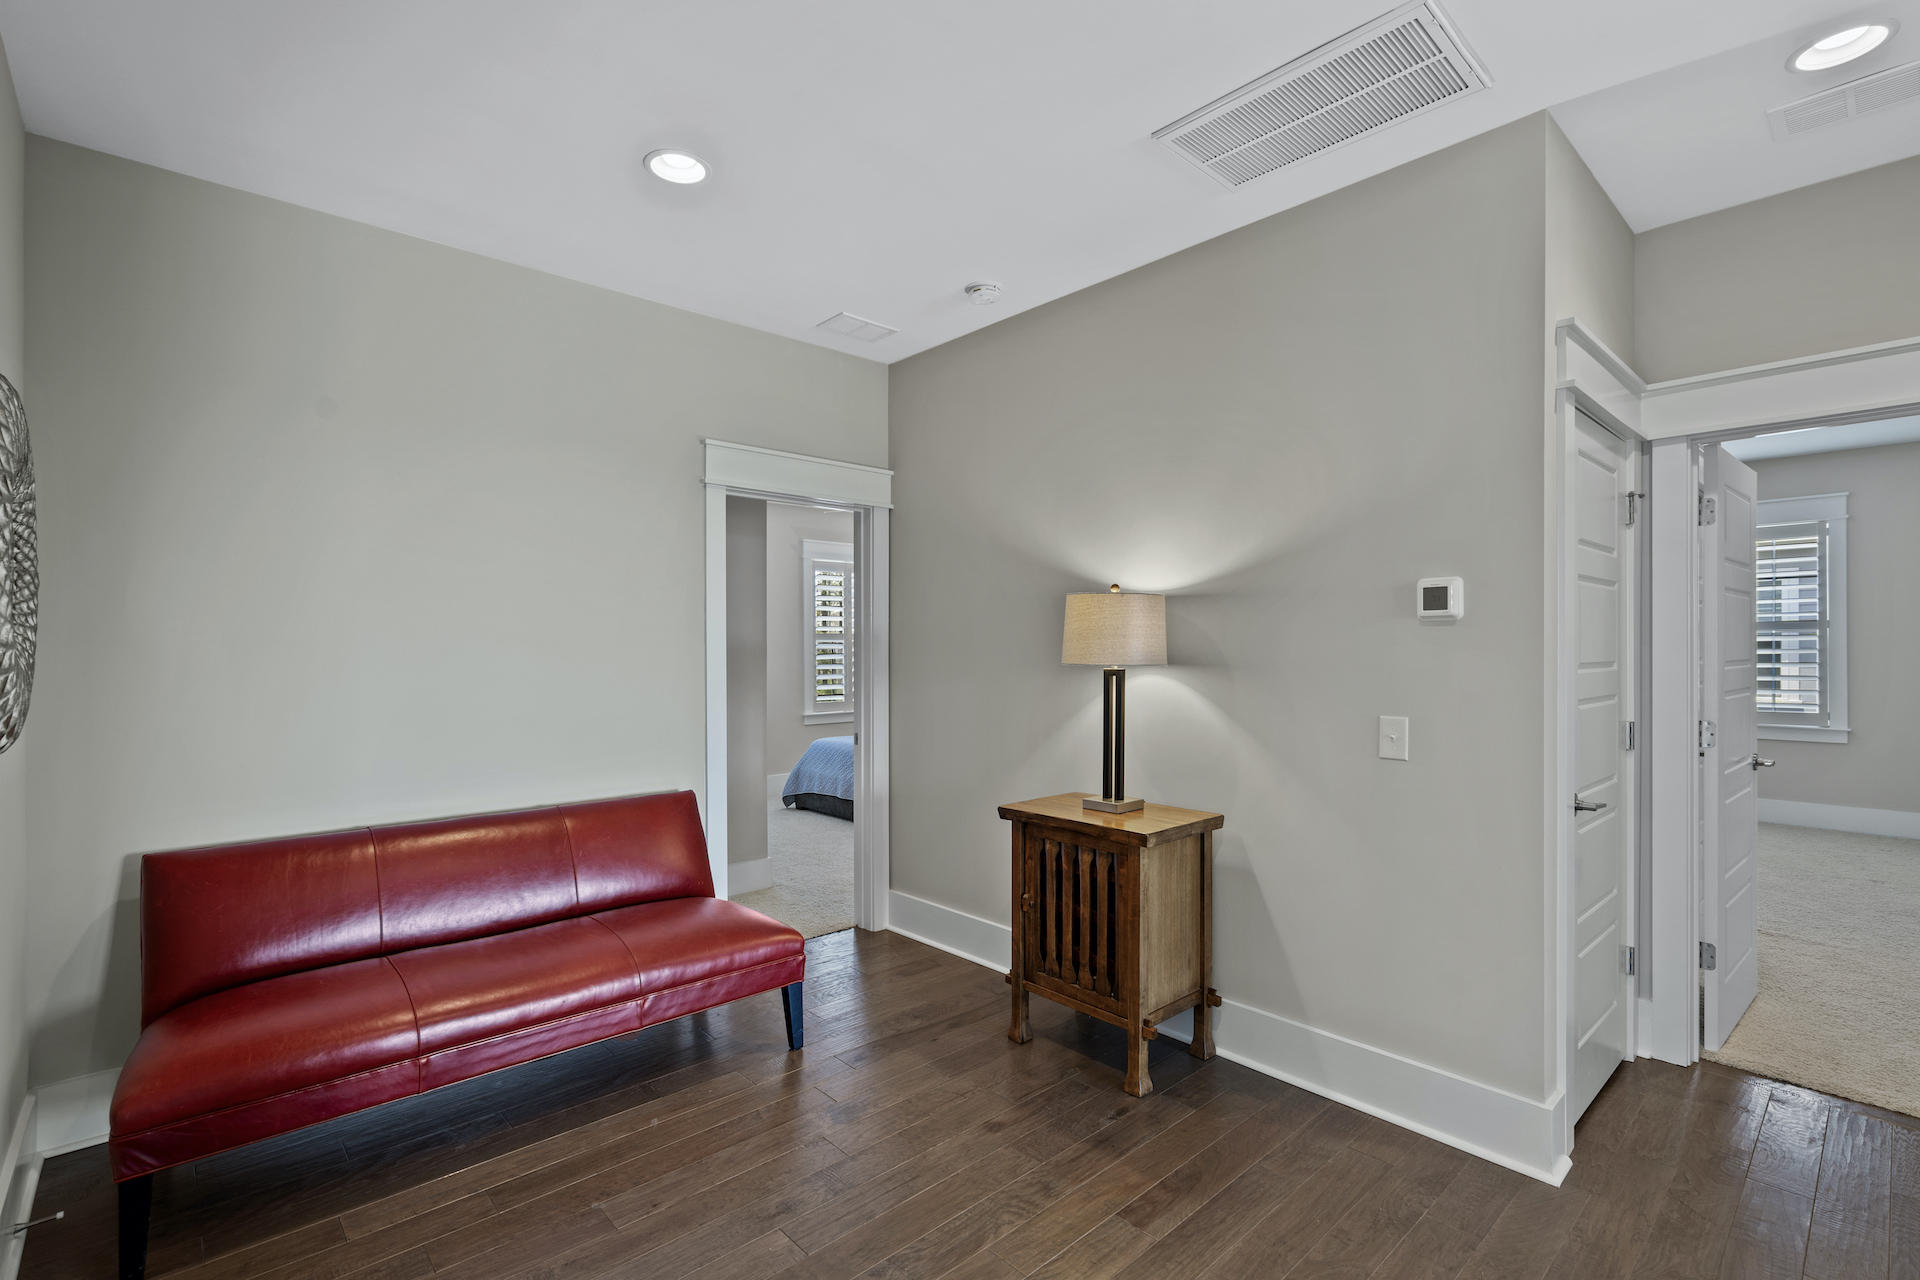 Dunes West Homes For Sale - 2316 Bucktail, Mount Pleasant, SC - 24